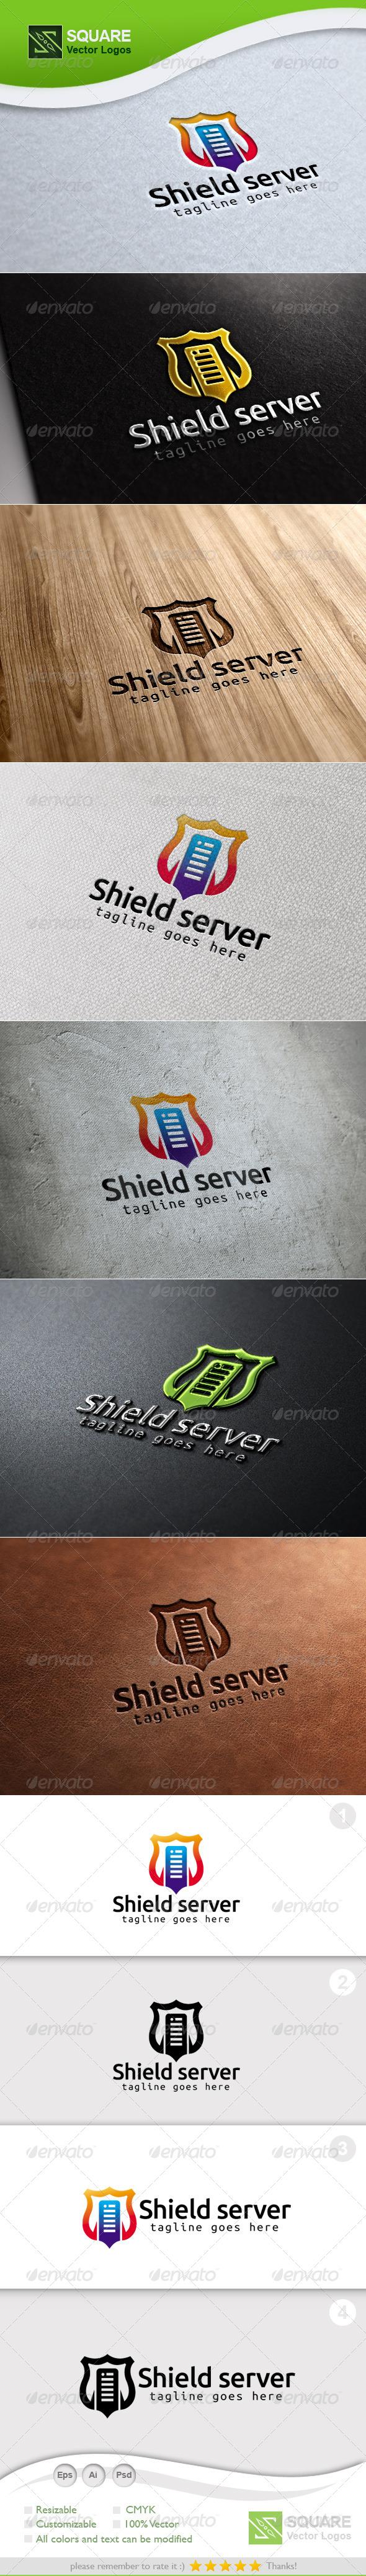 Shield, Server Vector Logo Template - Symbols Logo Templates